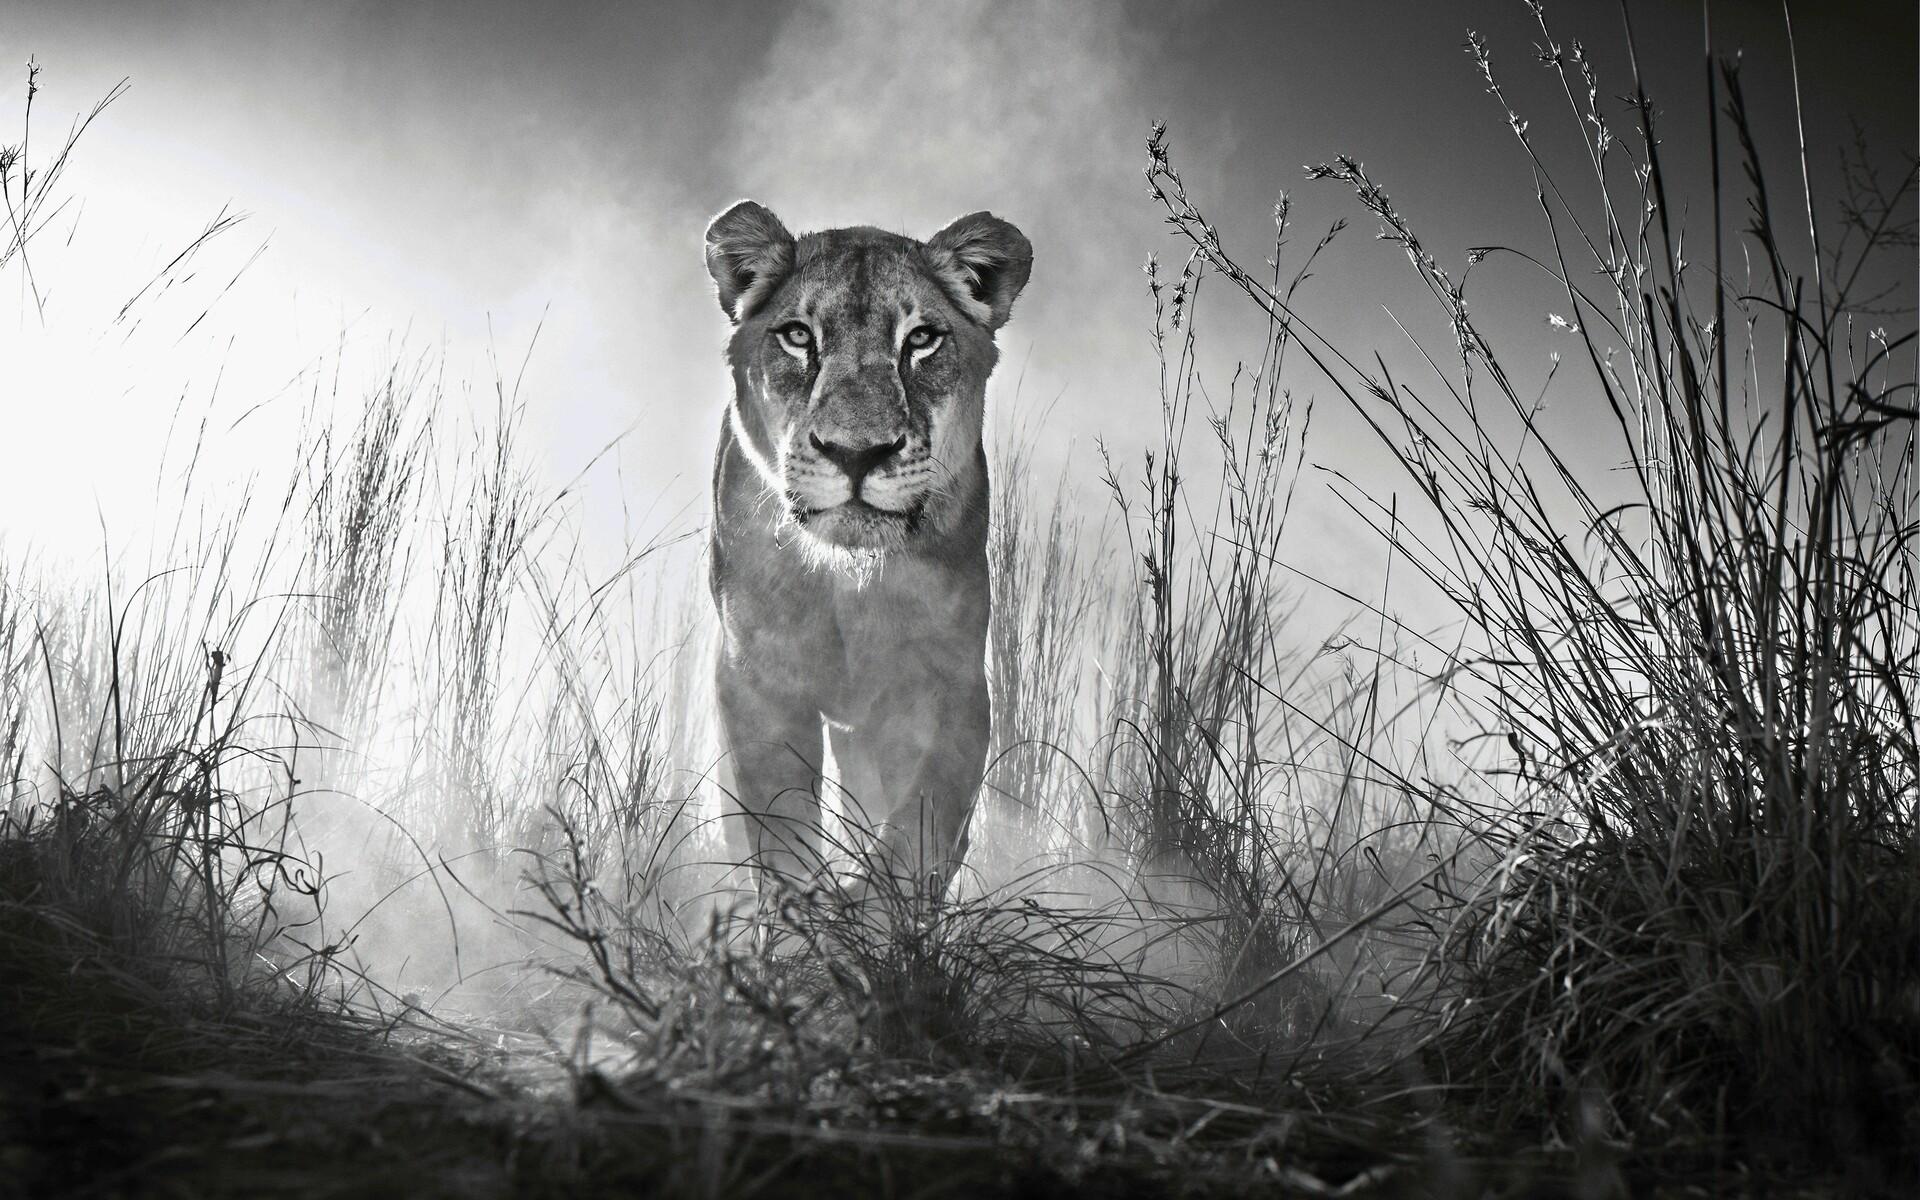 1920x1200 Lion 4k Black And White 1080p Resolution Hd 4k